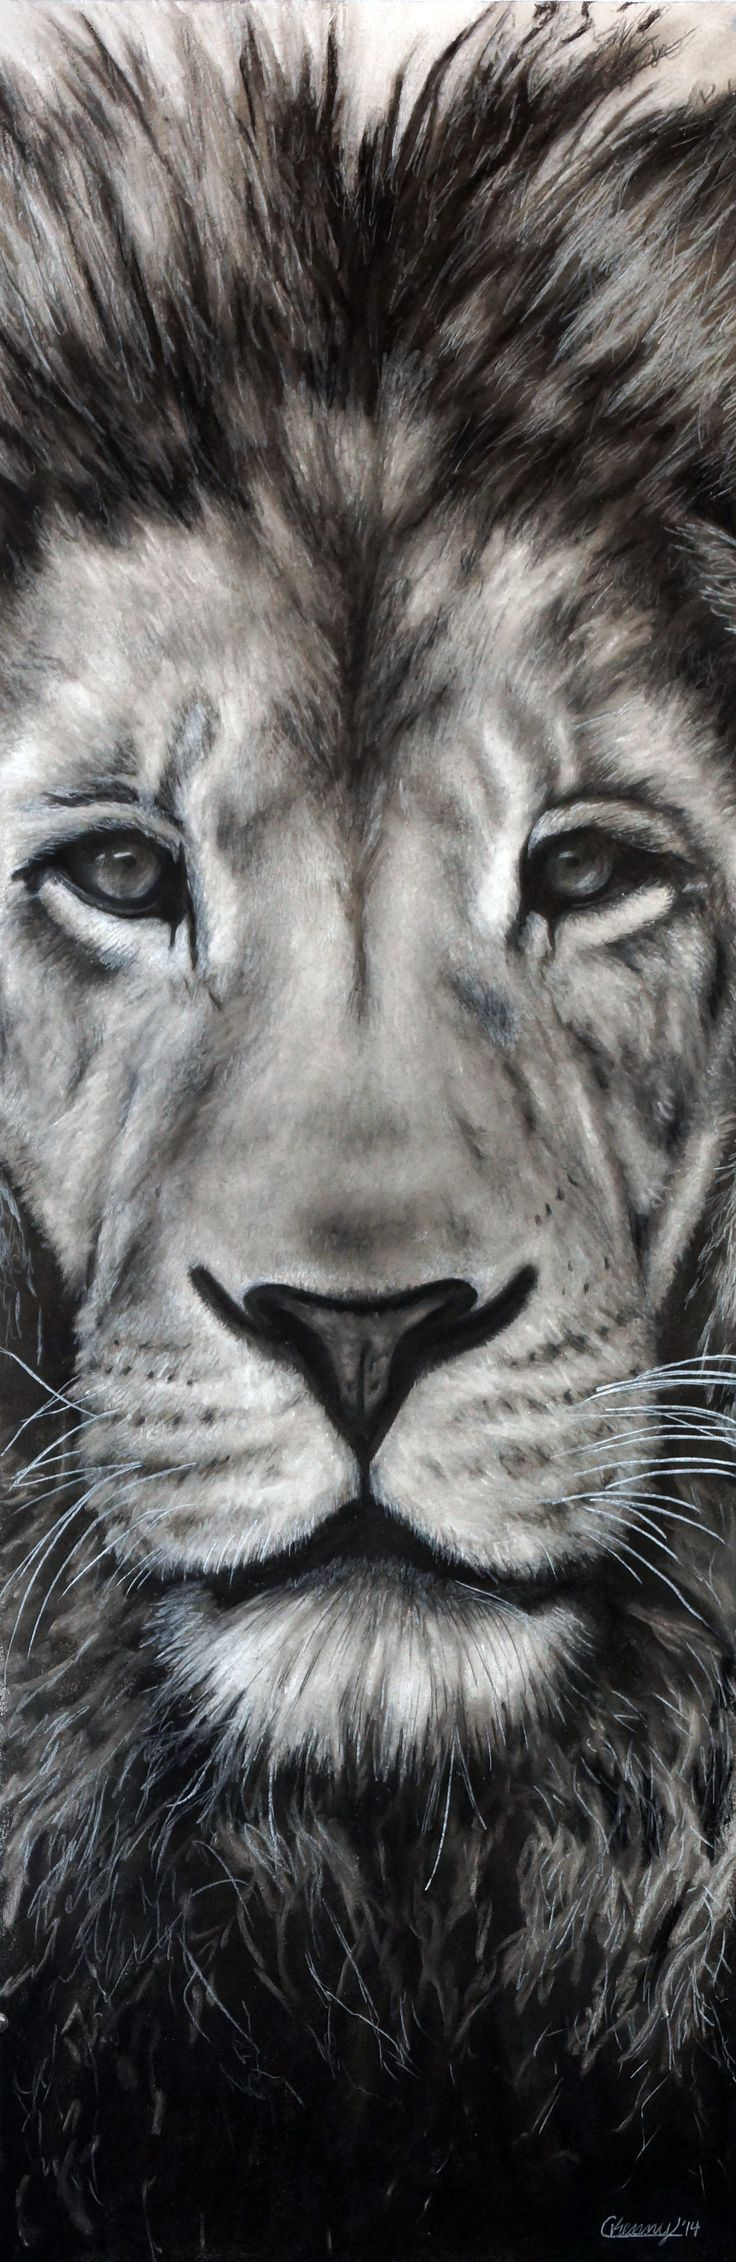 """Guardian"" by Nebraska artist Courtney Kenny Porto."